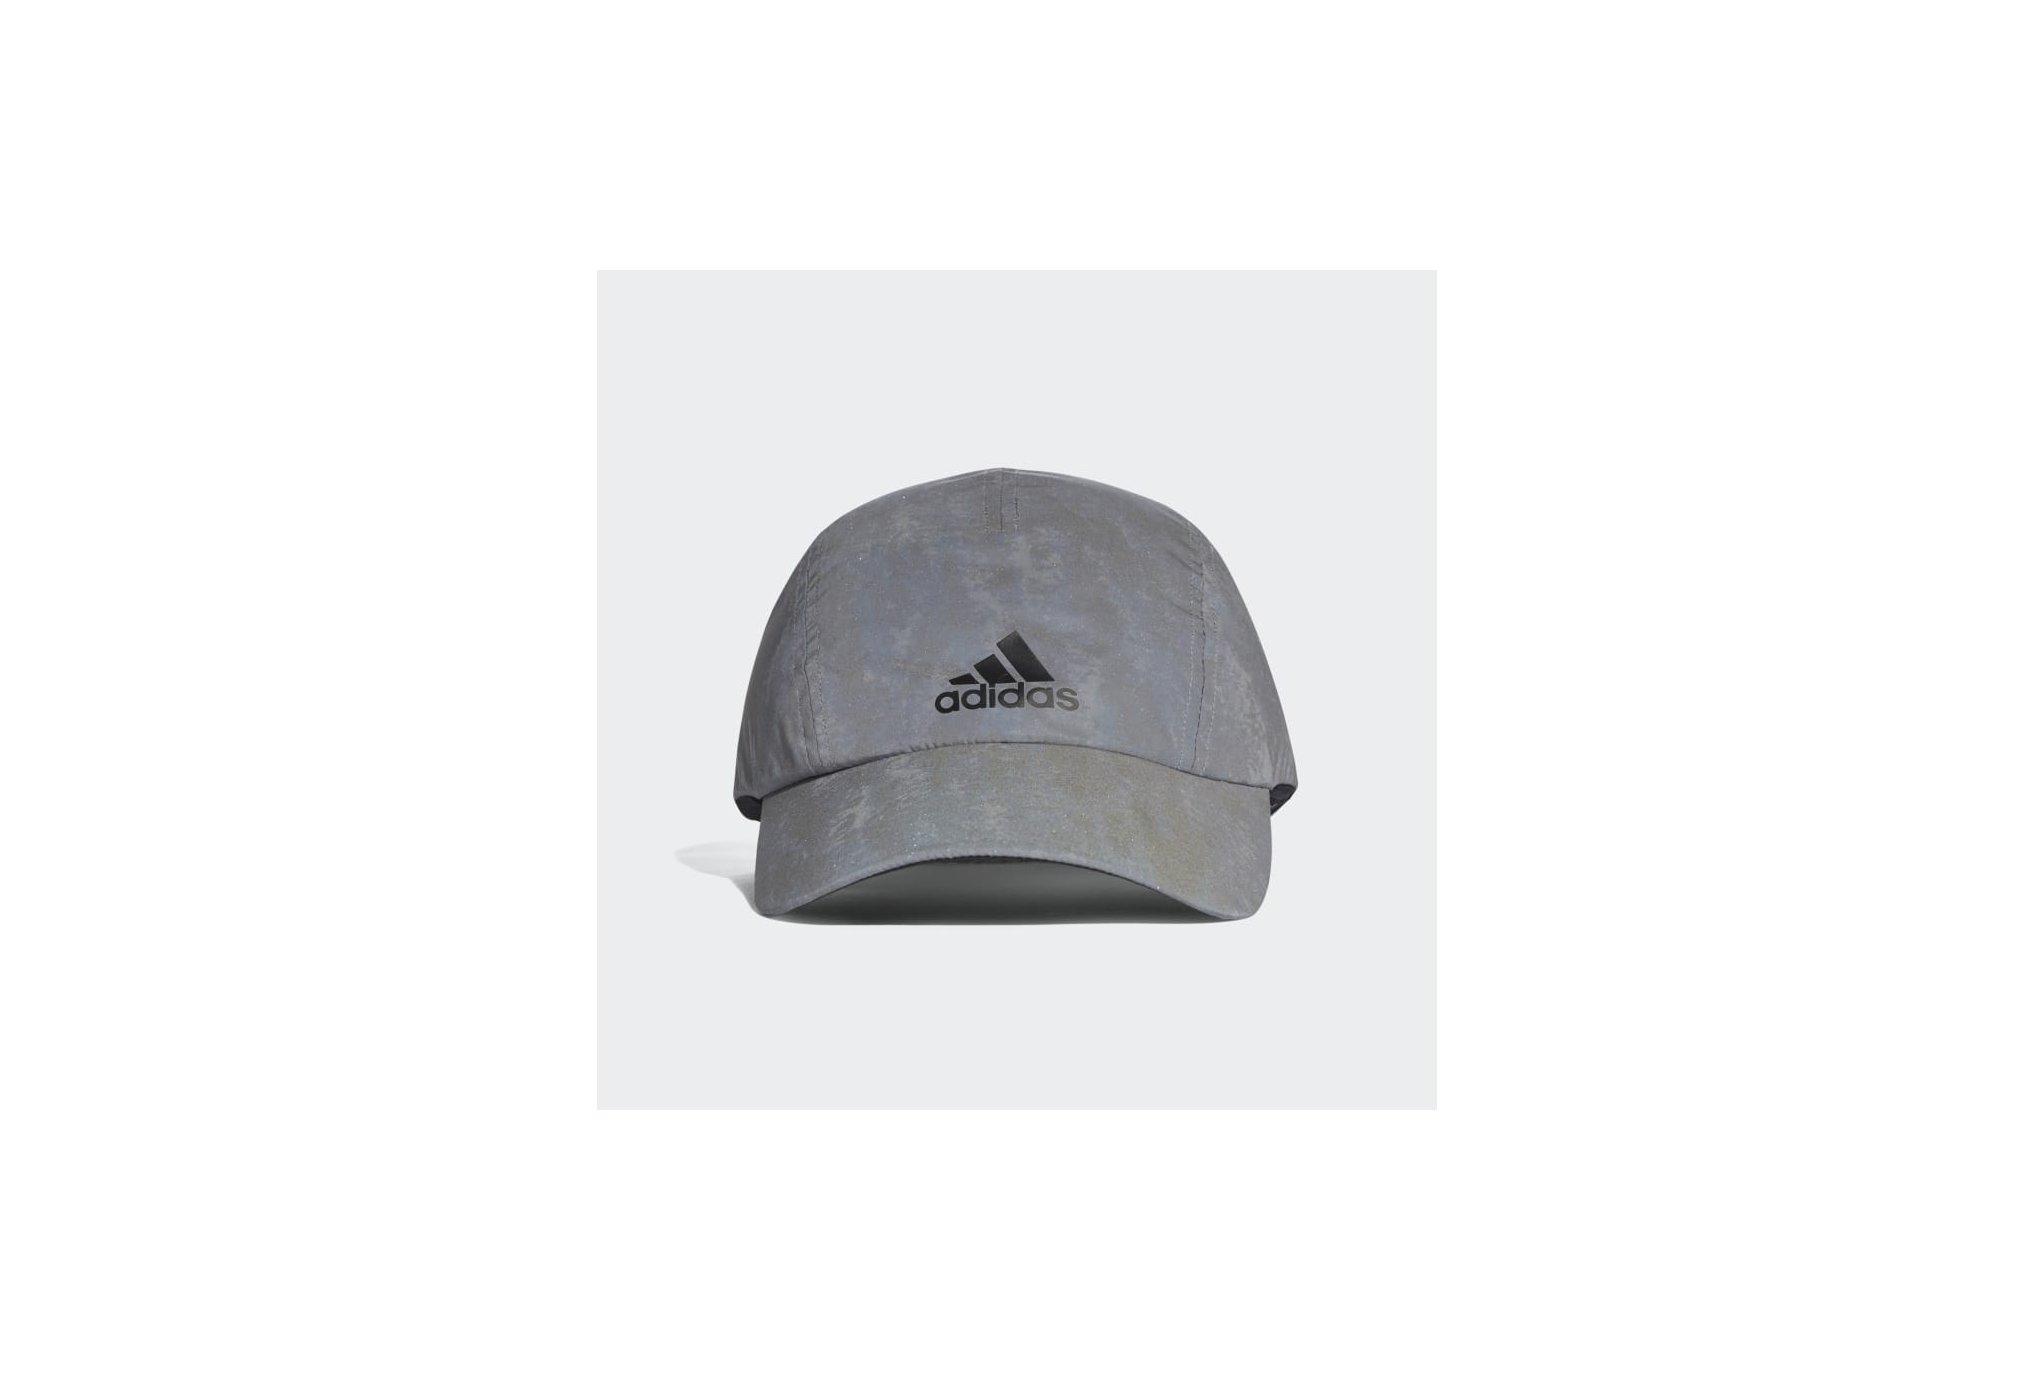 Adidas Run reflective casquettes / bandeaux